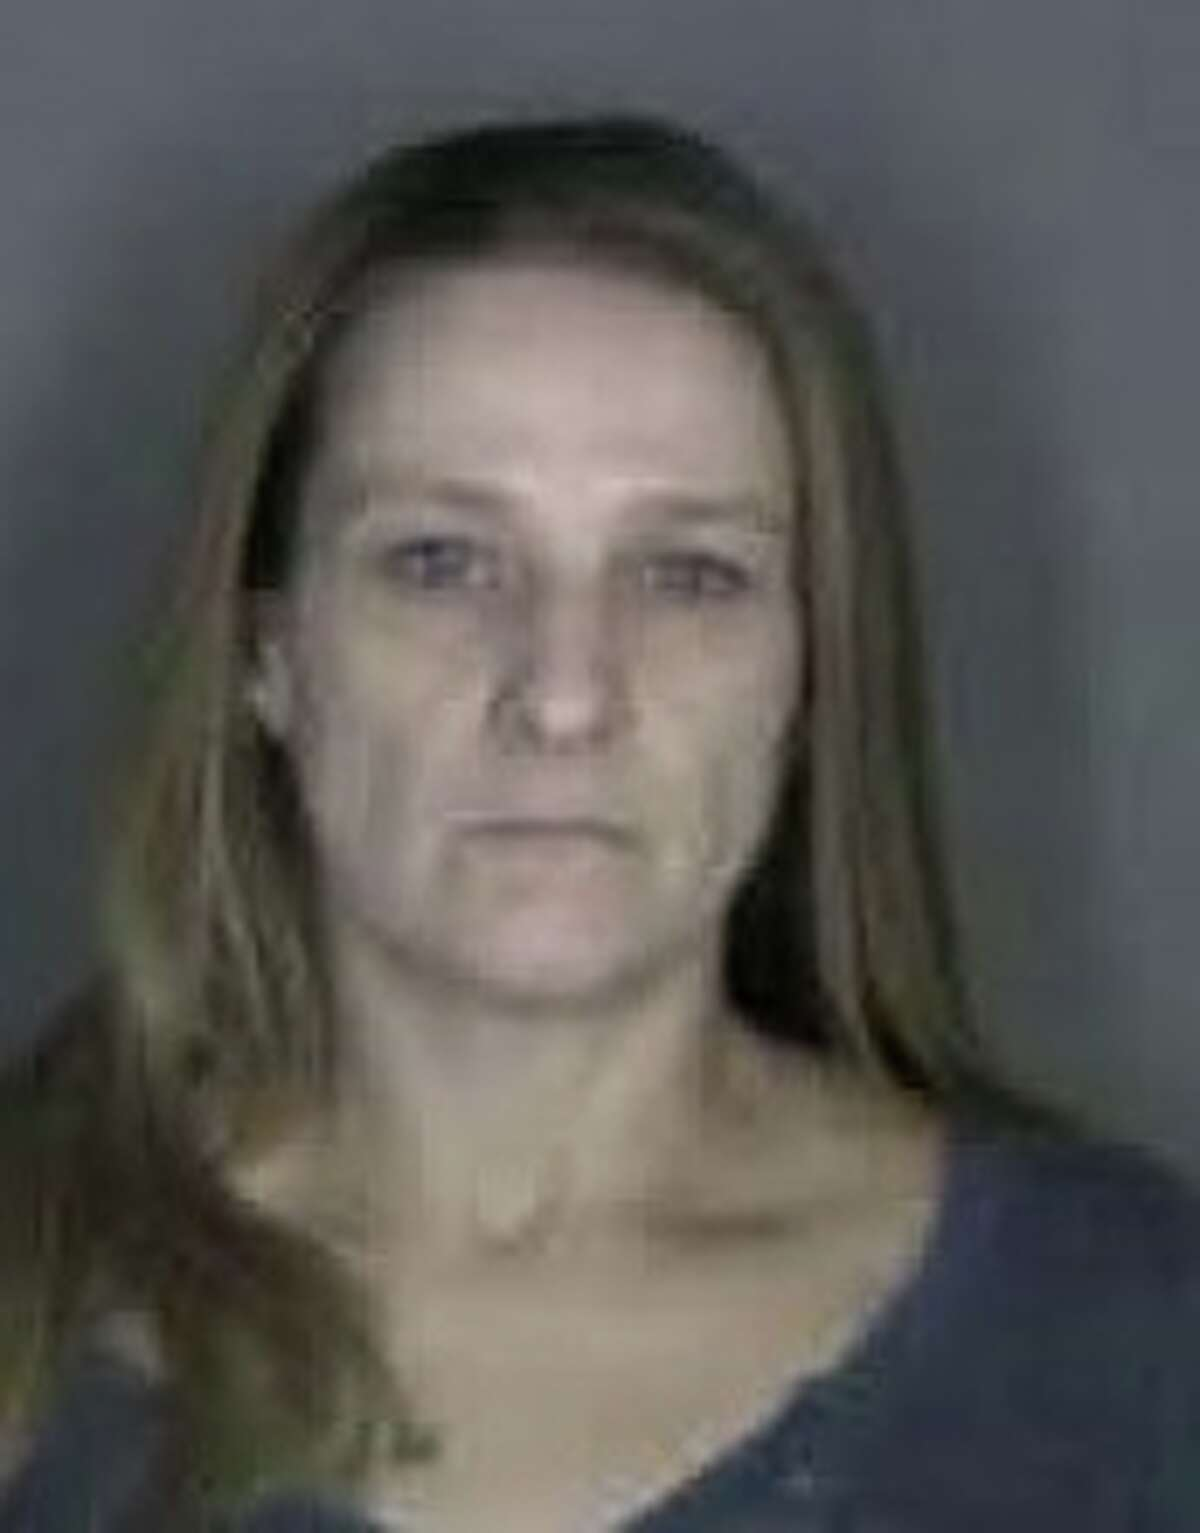 Marjorie L. Shuford (East Greenbush police photo)